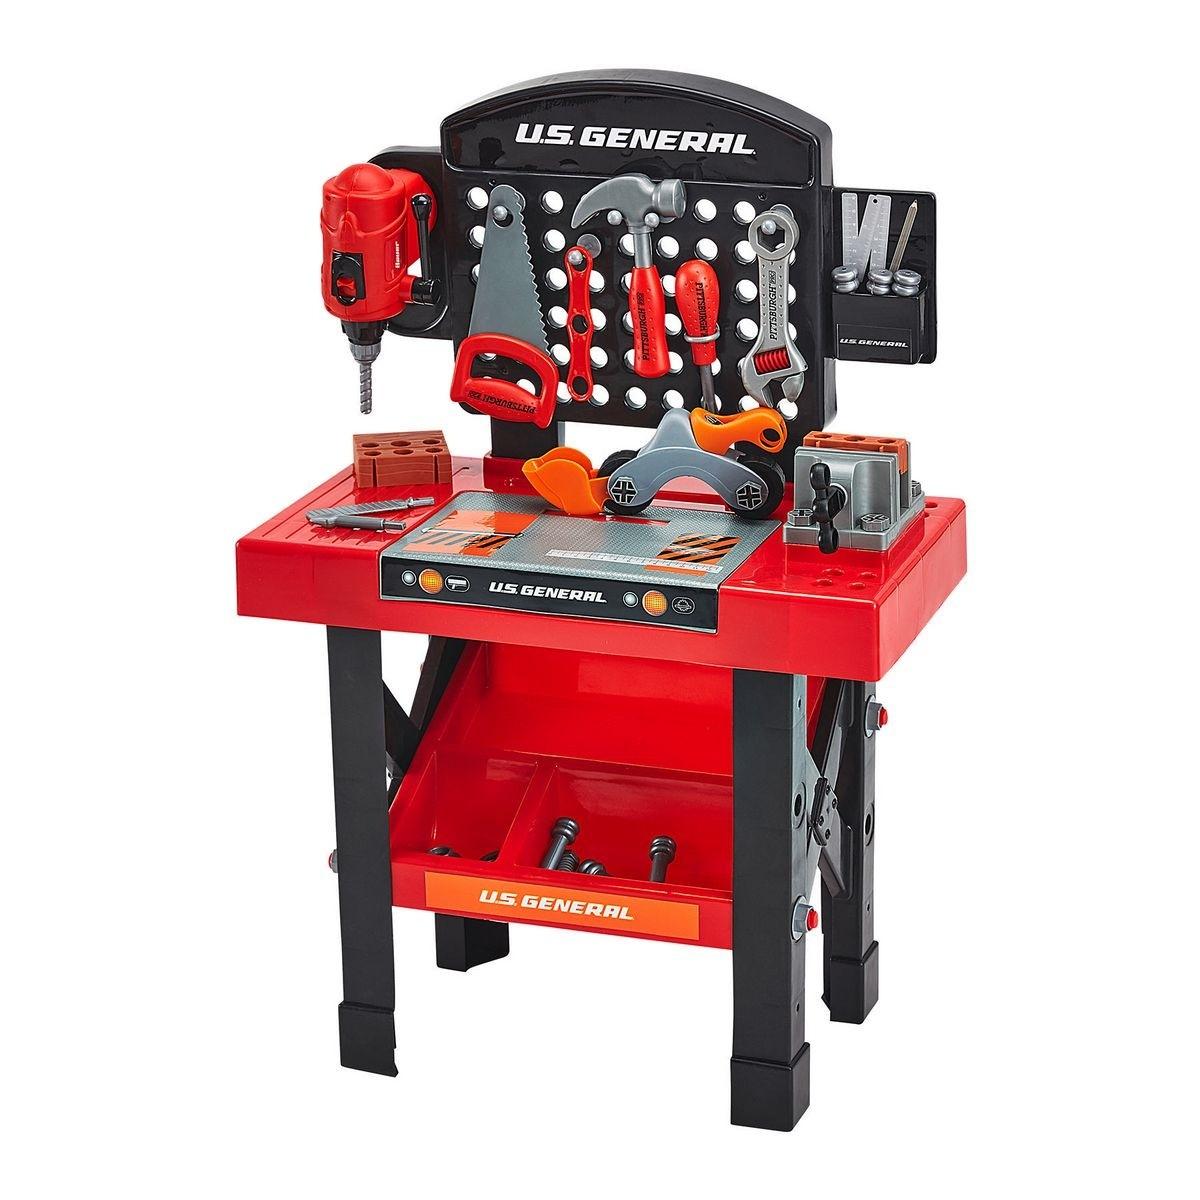 U.S. GENERAL JUNIOR Toy Workbench - Item 56515